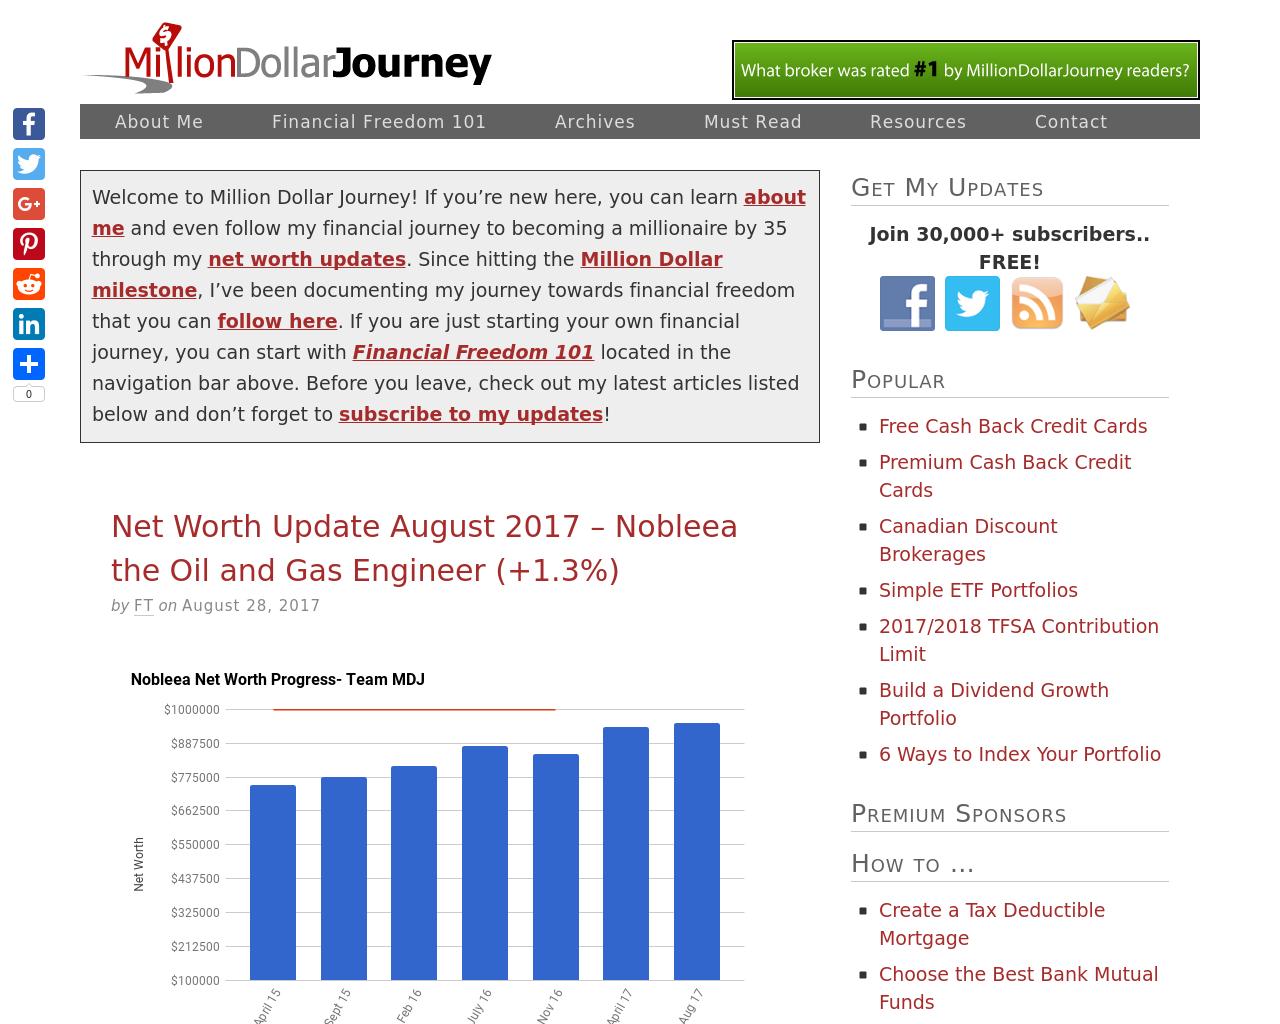 Million-Dollar-Journey-Advertising-Reviews-Pricing